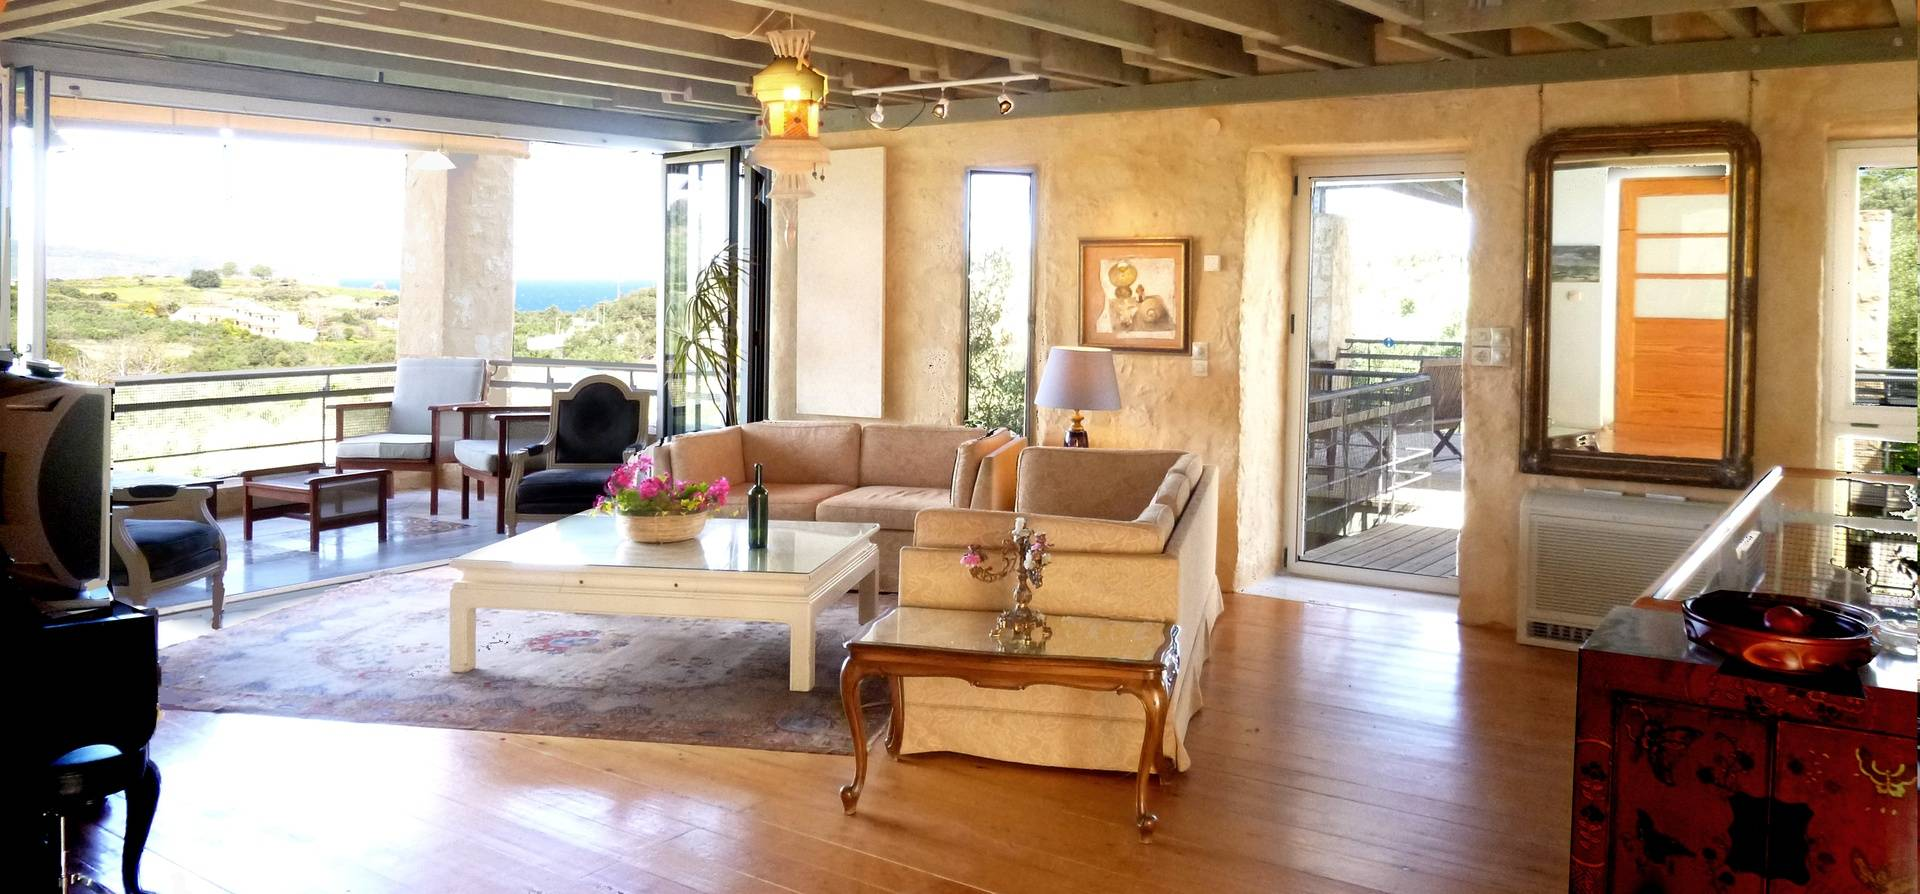 Main floor: living room